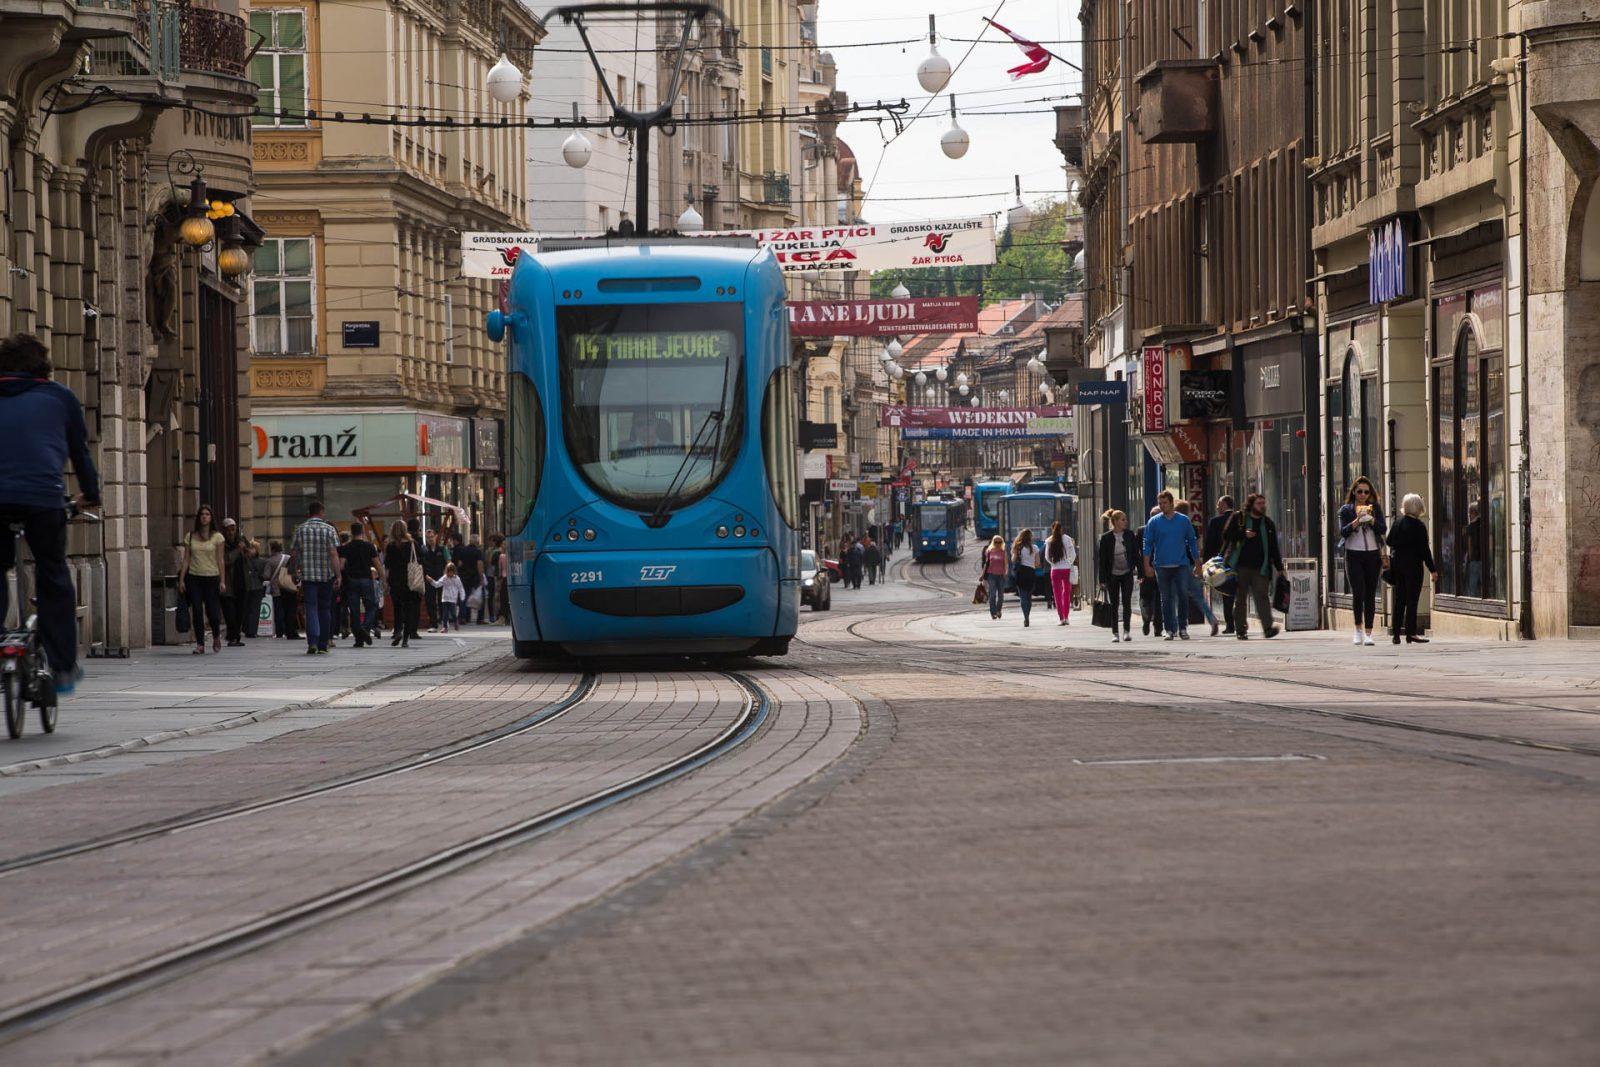 Just Zagreb, Ilica, tram